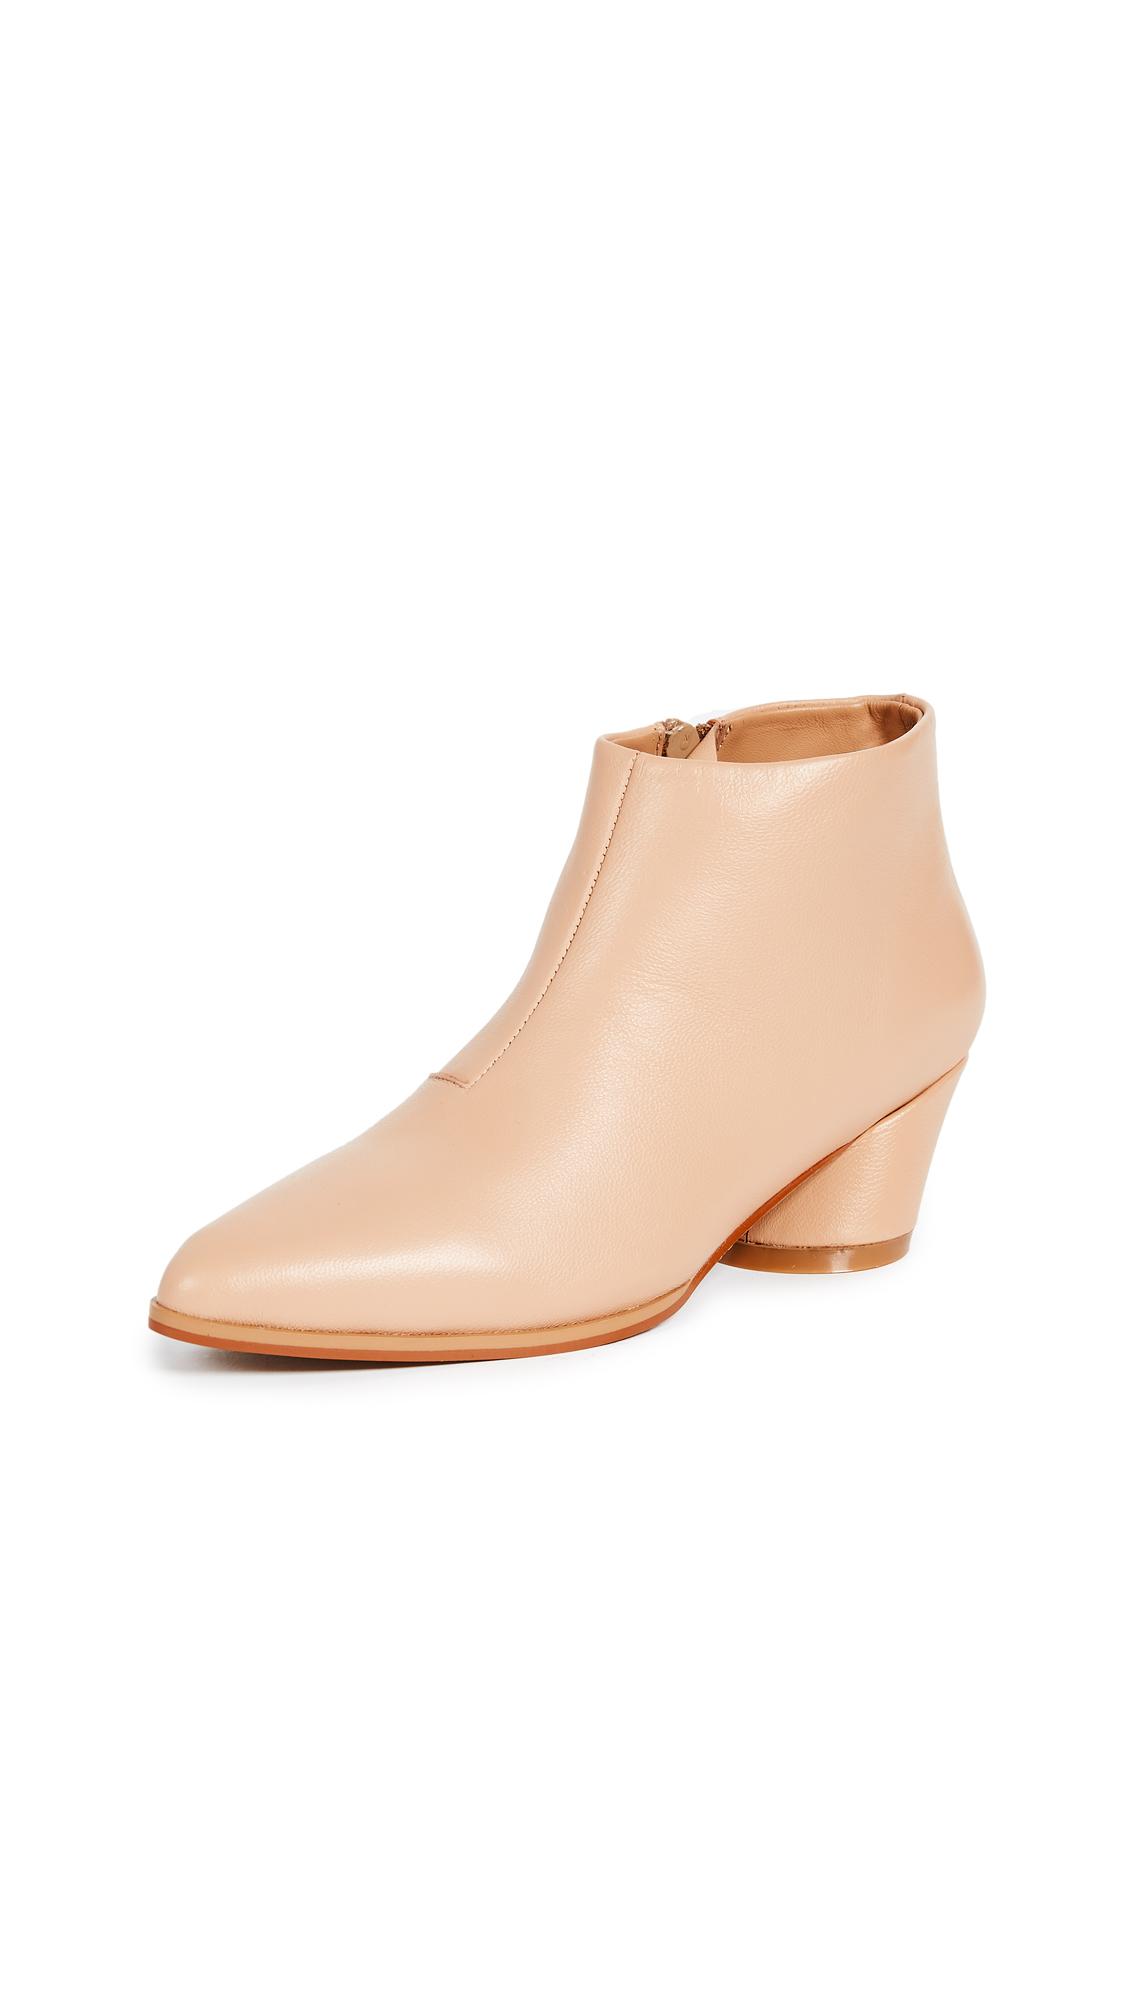 JAGGAR Angular Ankle Boots - Sand